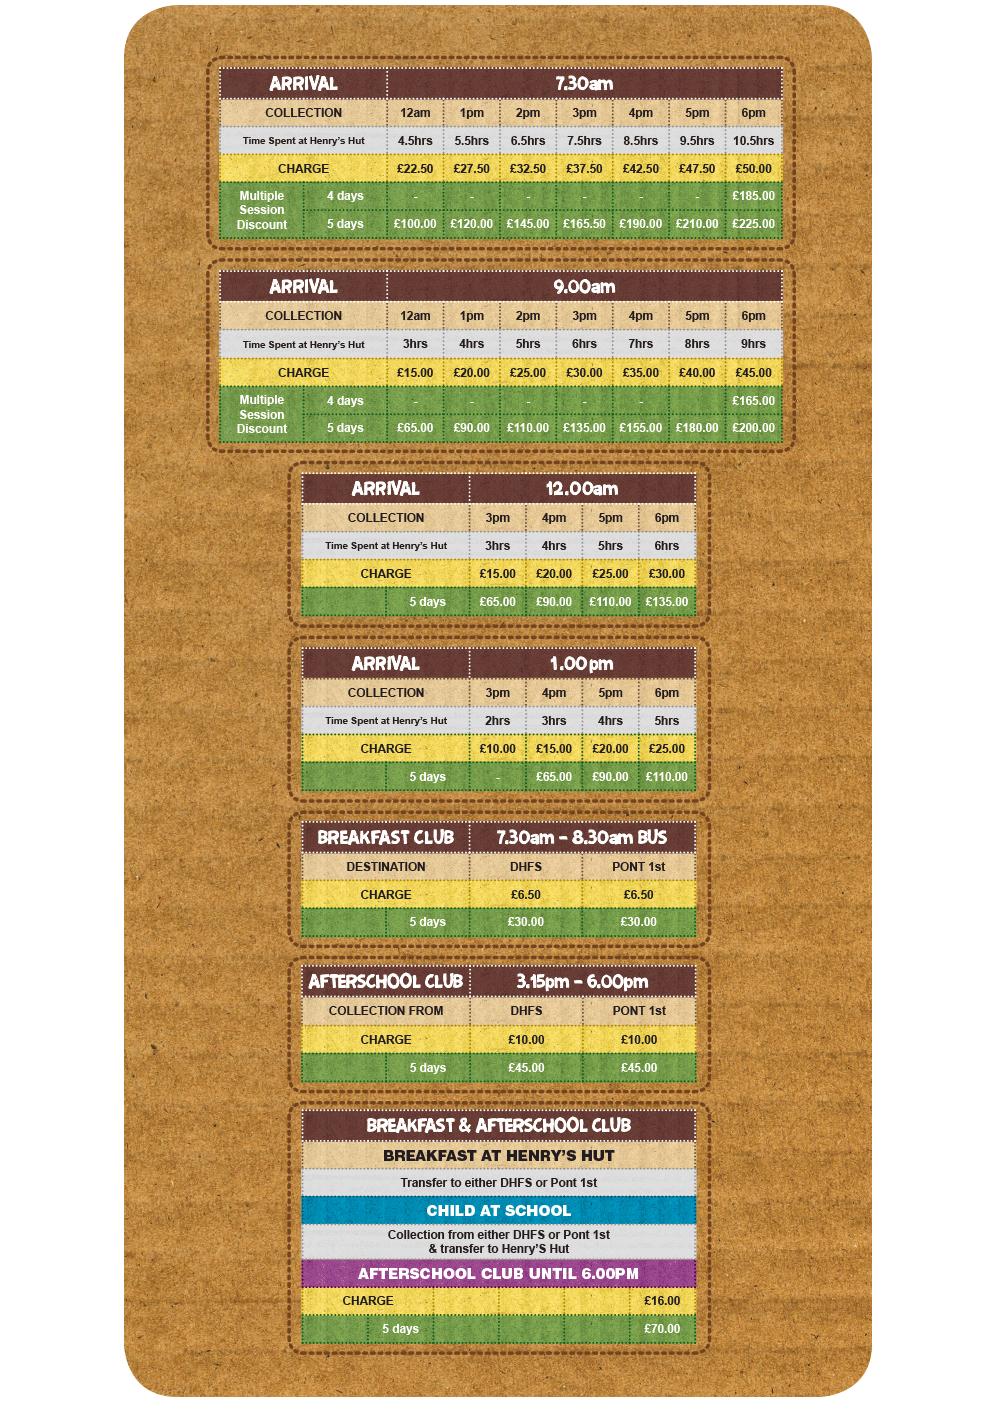 HH-session_times-11-10-18v2